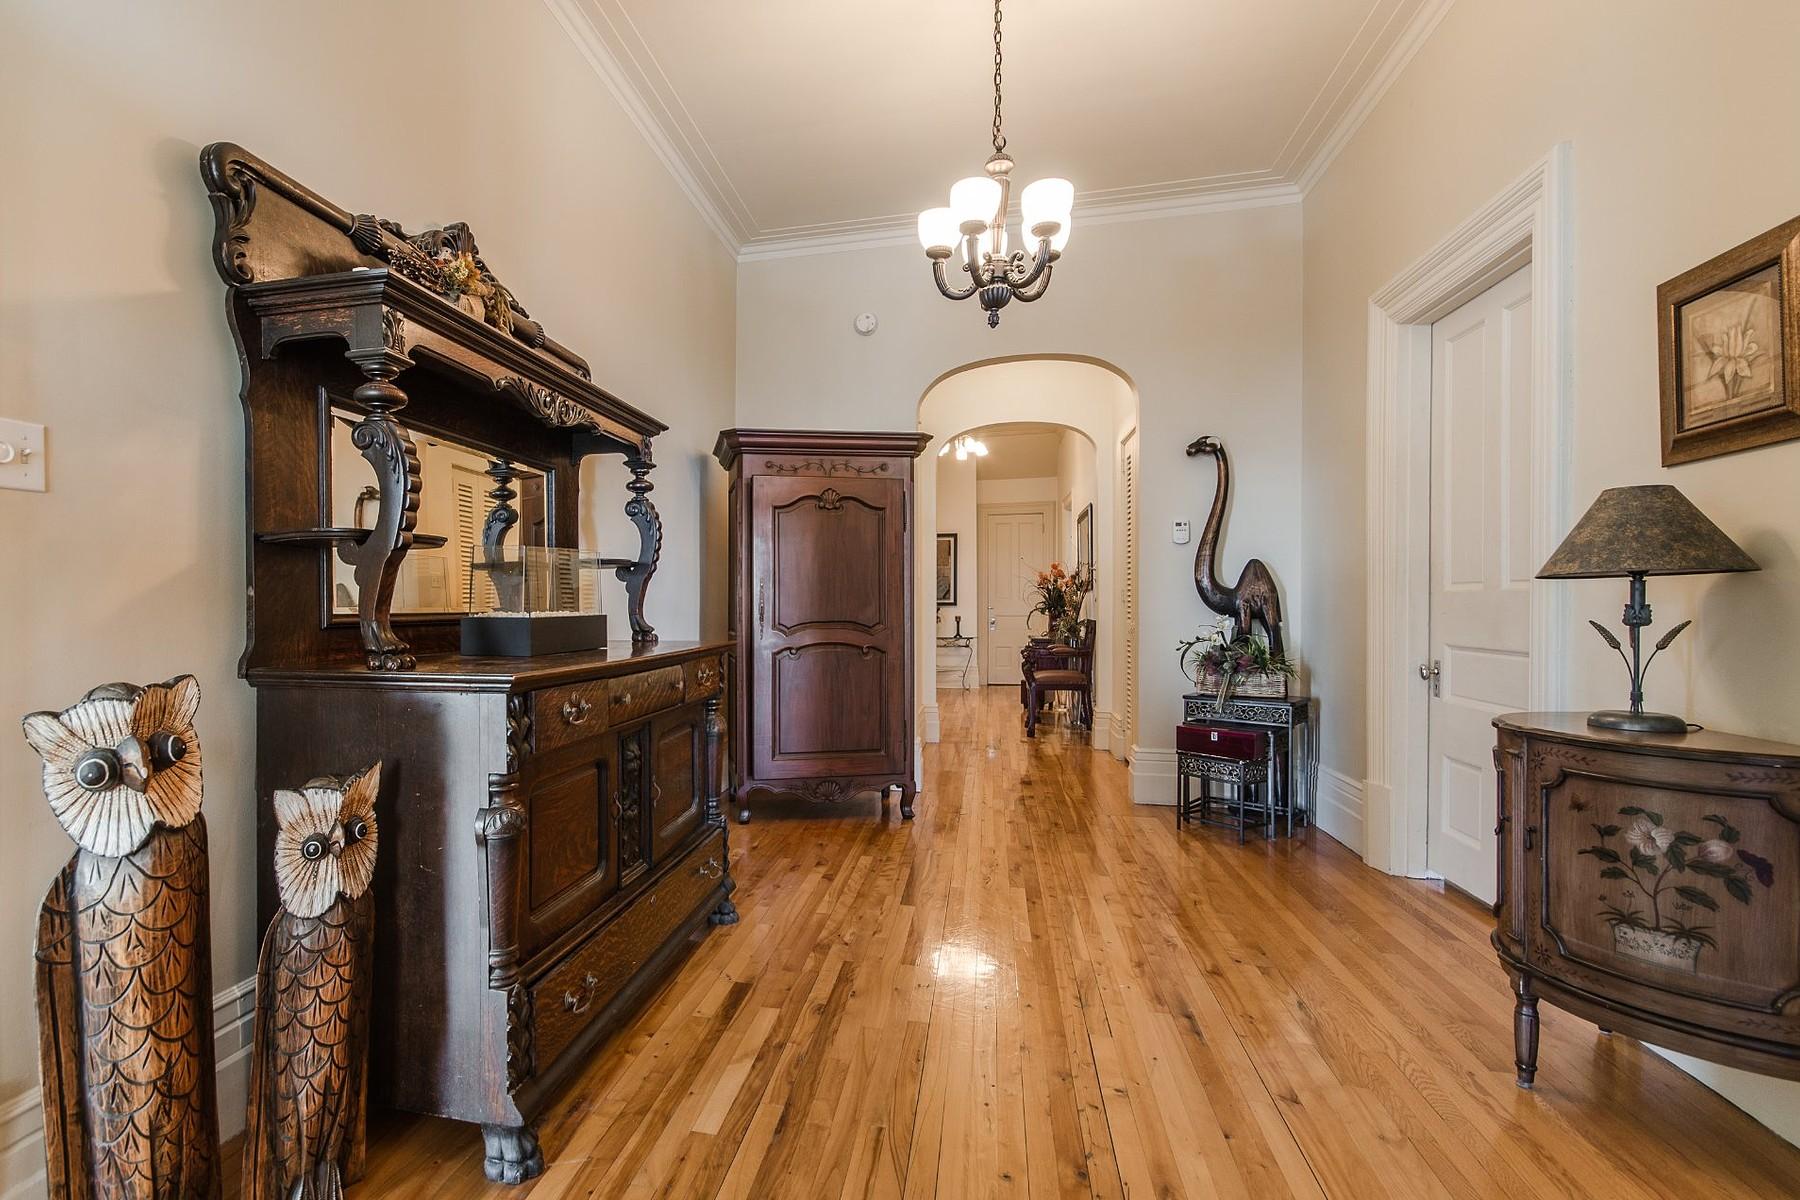 Additional photo for property listing at Saint-Hyacinthe, Montérégie 2610 Rue Girouard O. 圣亚森特, 魁北克省 J2S2B4 加拿大